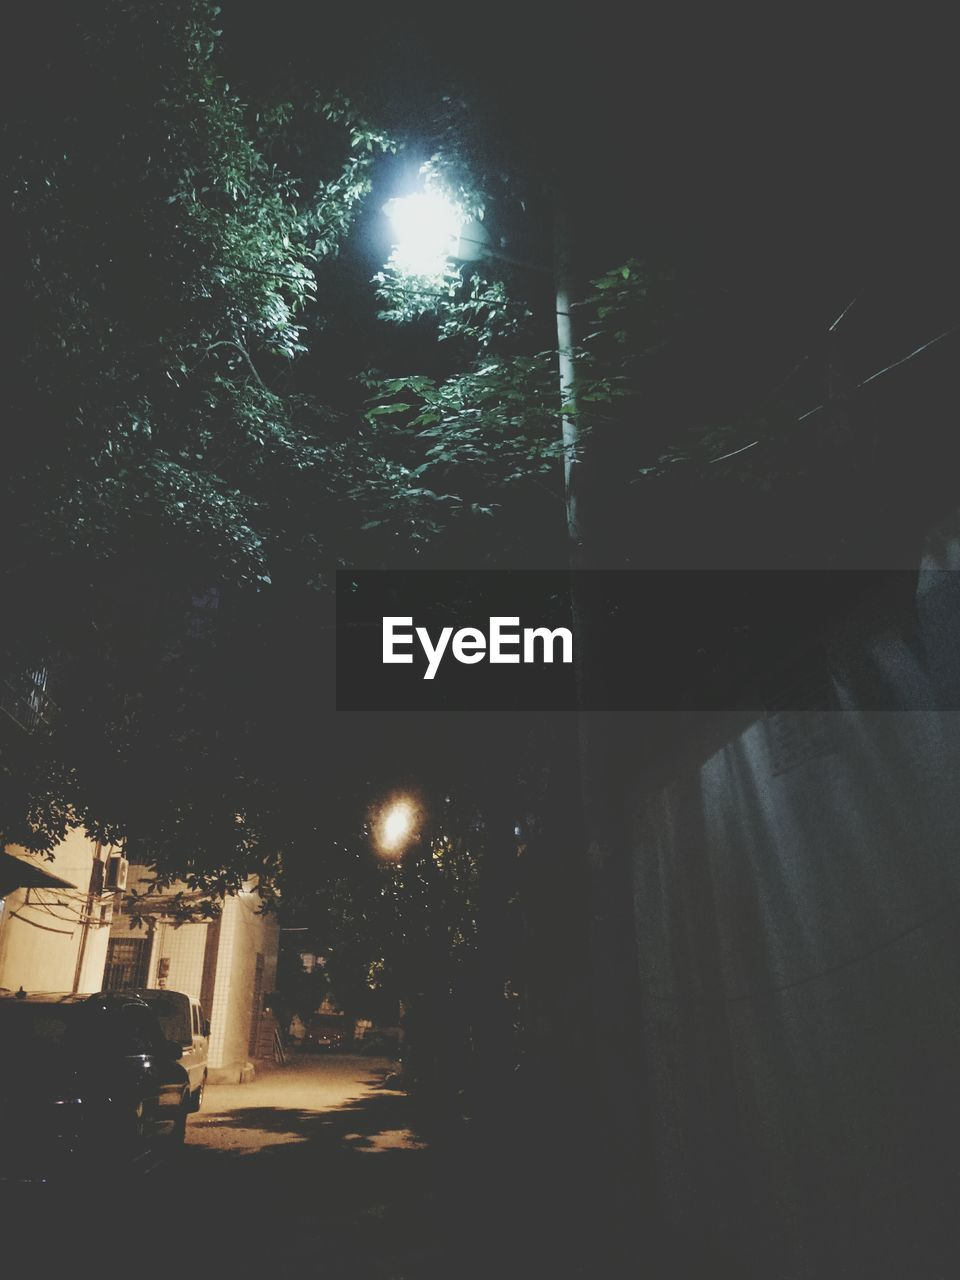 night, tree, illuminated, street light, car, street, outdoors, road, no people, land vehicle, transportation, city, architecture, building exterior, nature, sky